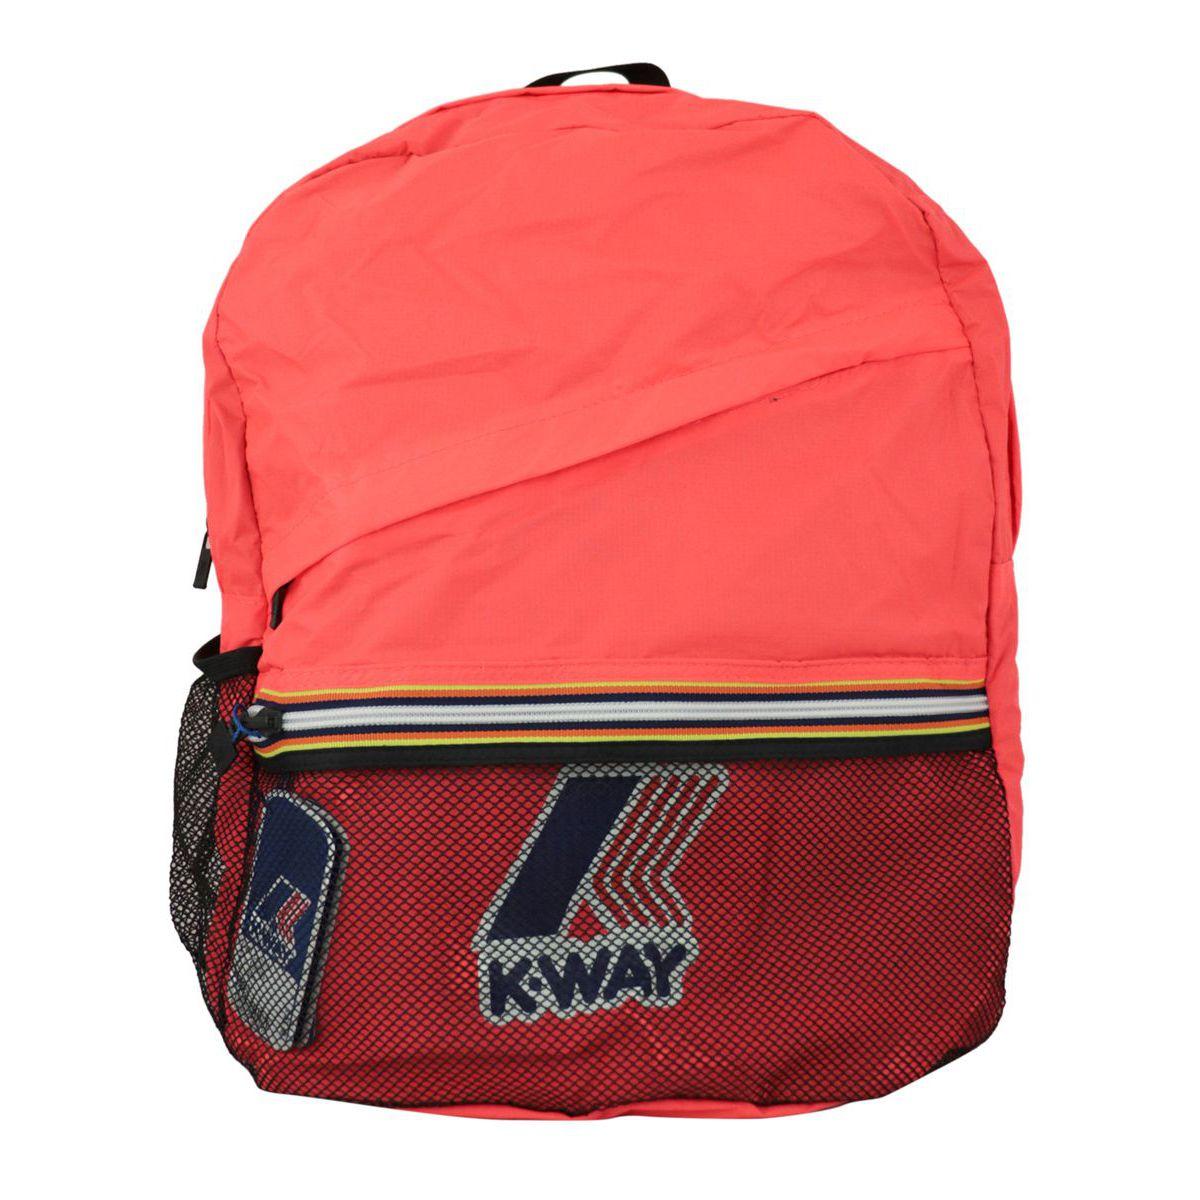 Le Vrai 3.0 Francois backpack Red K-Way